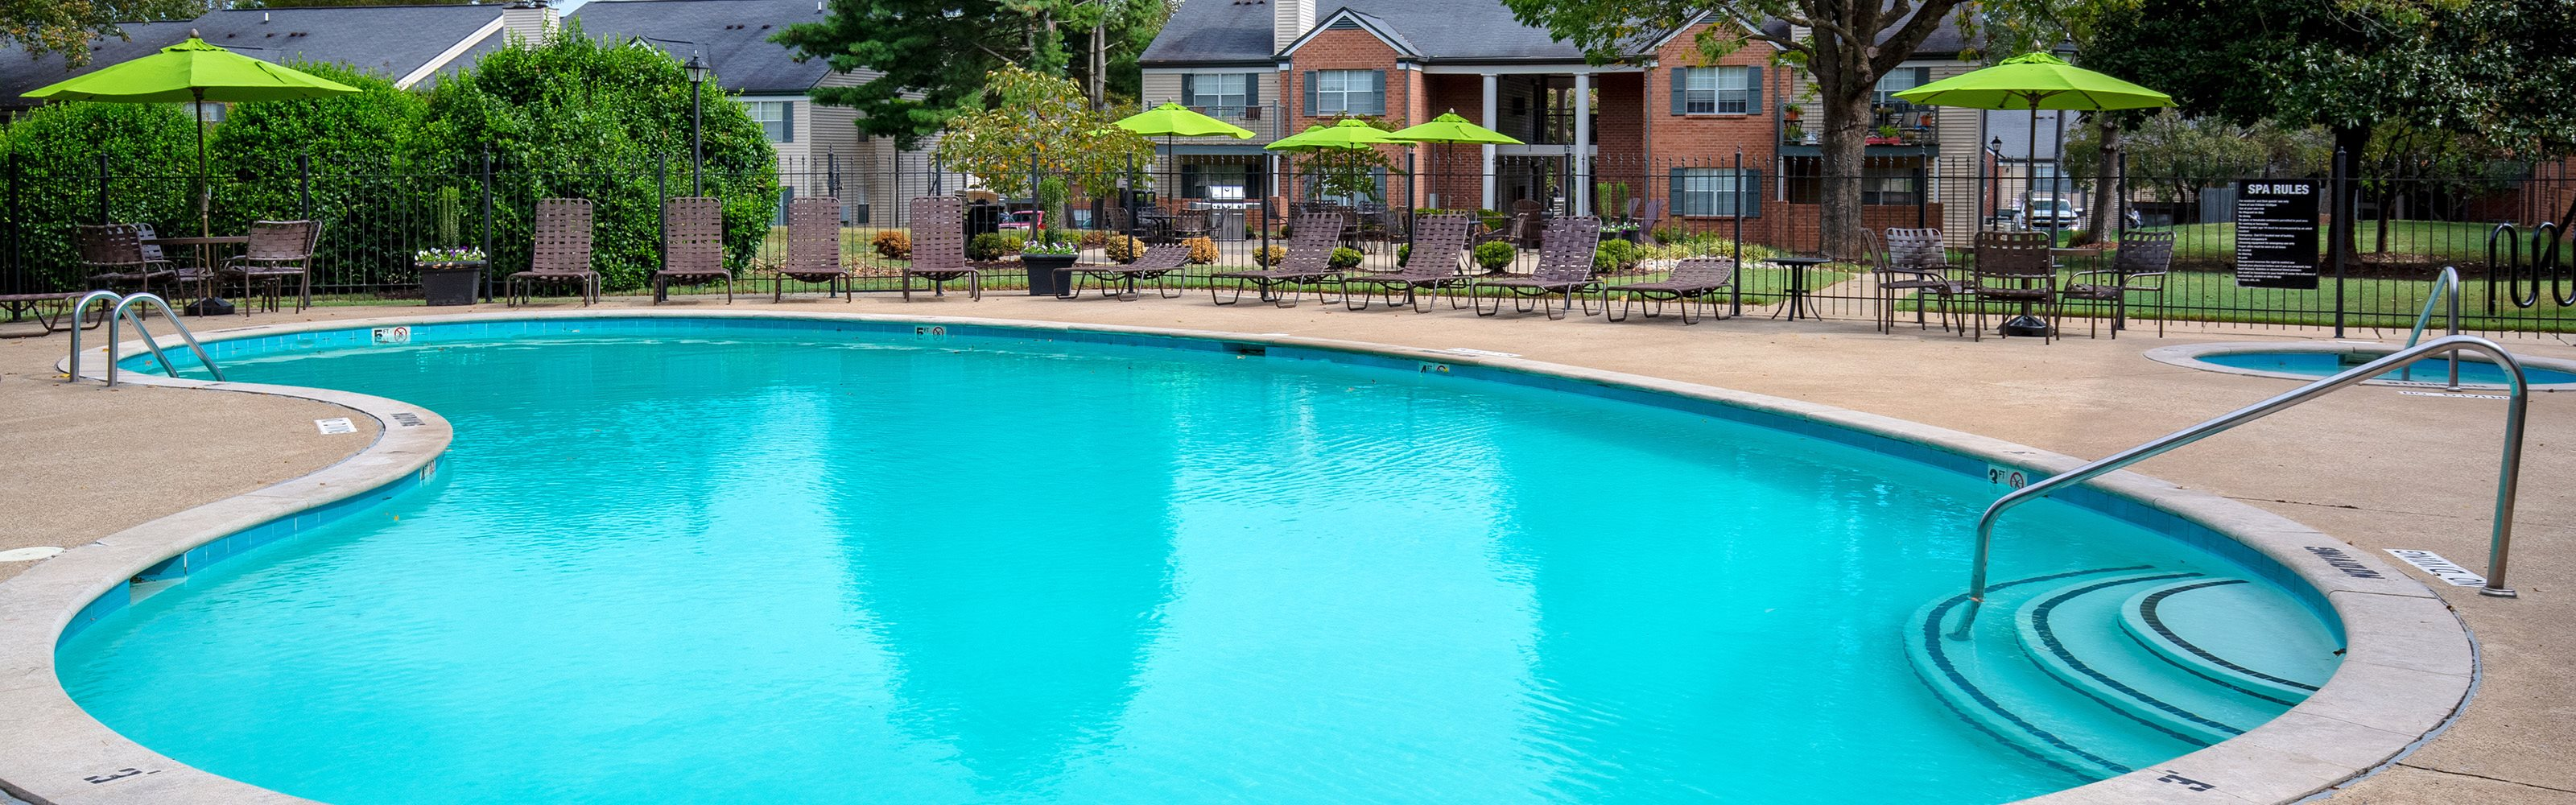 Littlestone of Village Green Apartments - Banner photo of pool